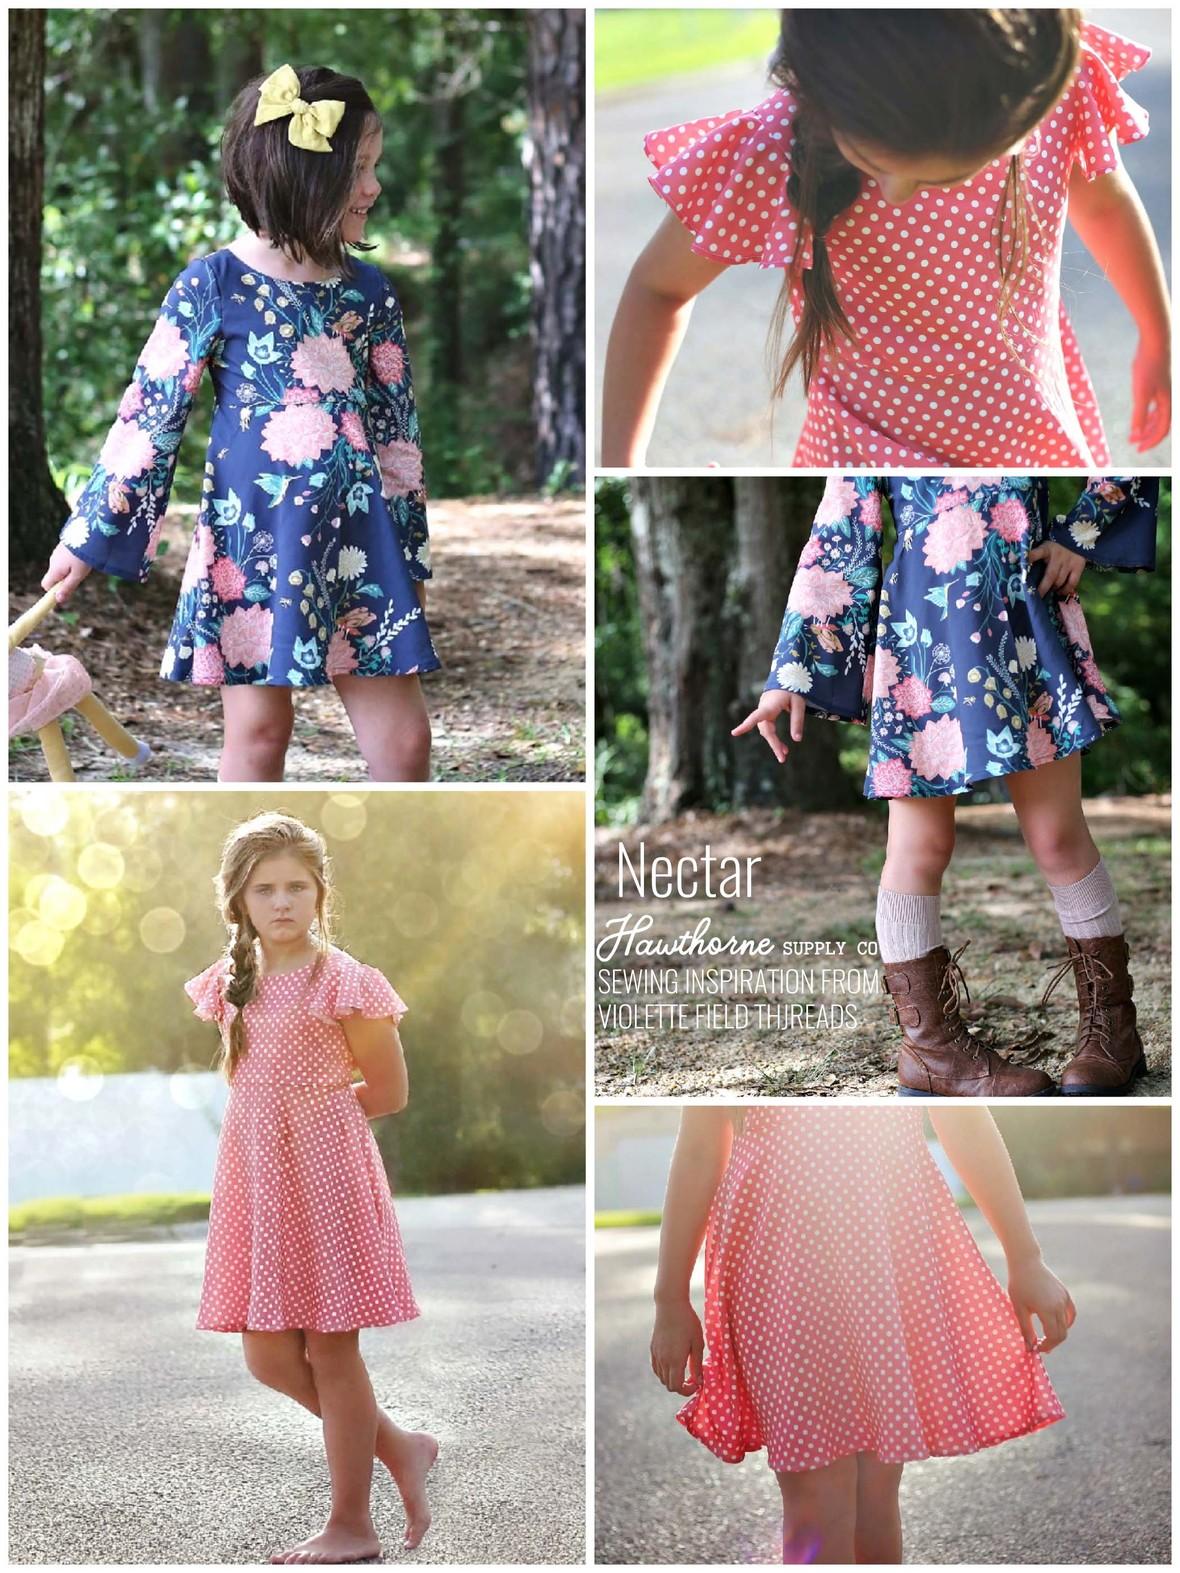 Nectar Rayon Fabric Hawthorne Supply Co